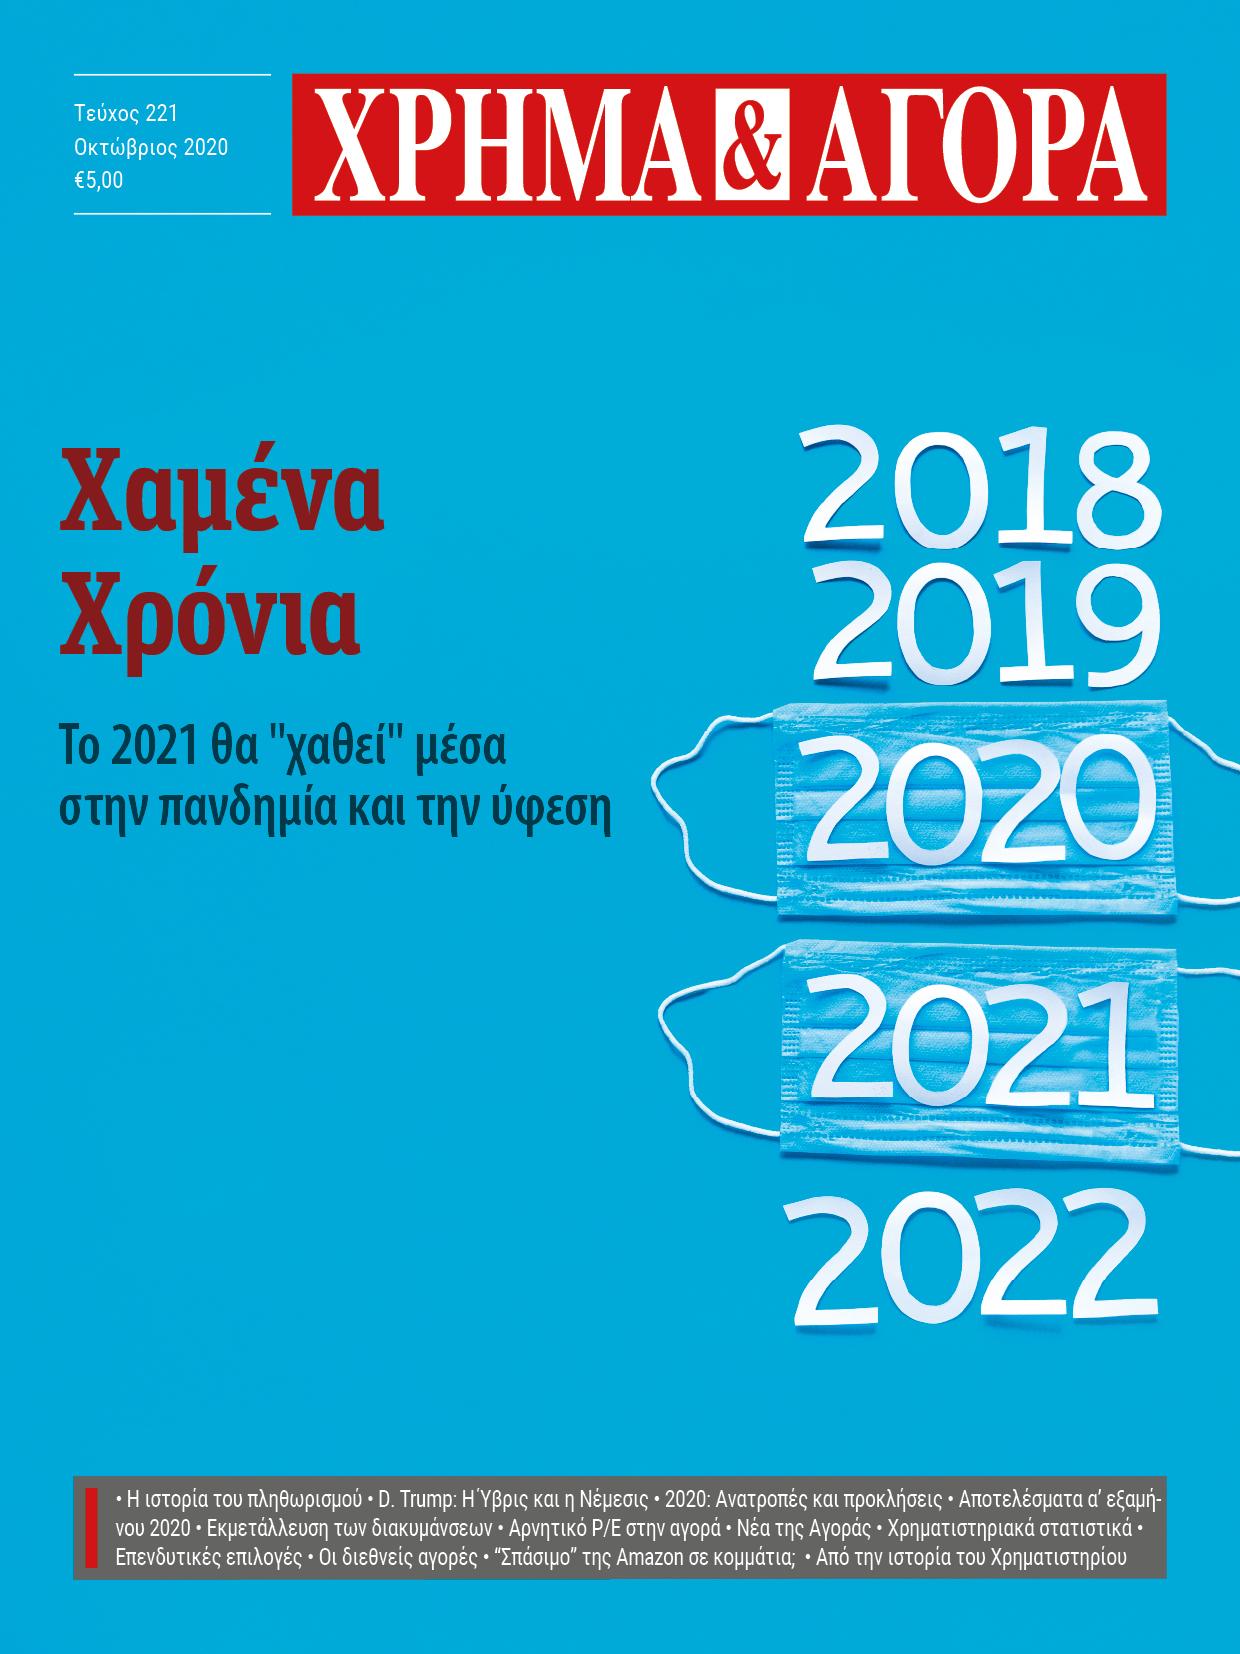 EuroCapital - ΧΡΗΜΑ & ΑΓΟΡΑ - Τεύχος 221 - Οκτώβριος 2020 - Περιεχόμενα